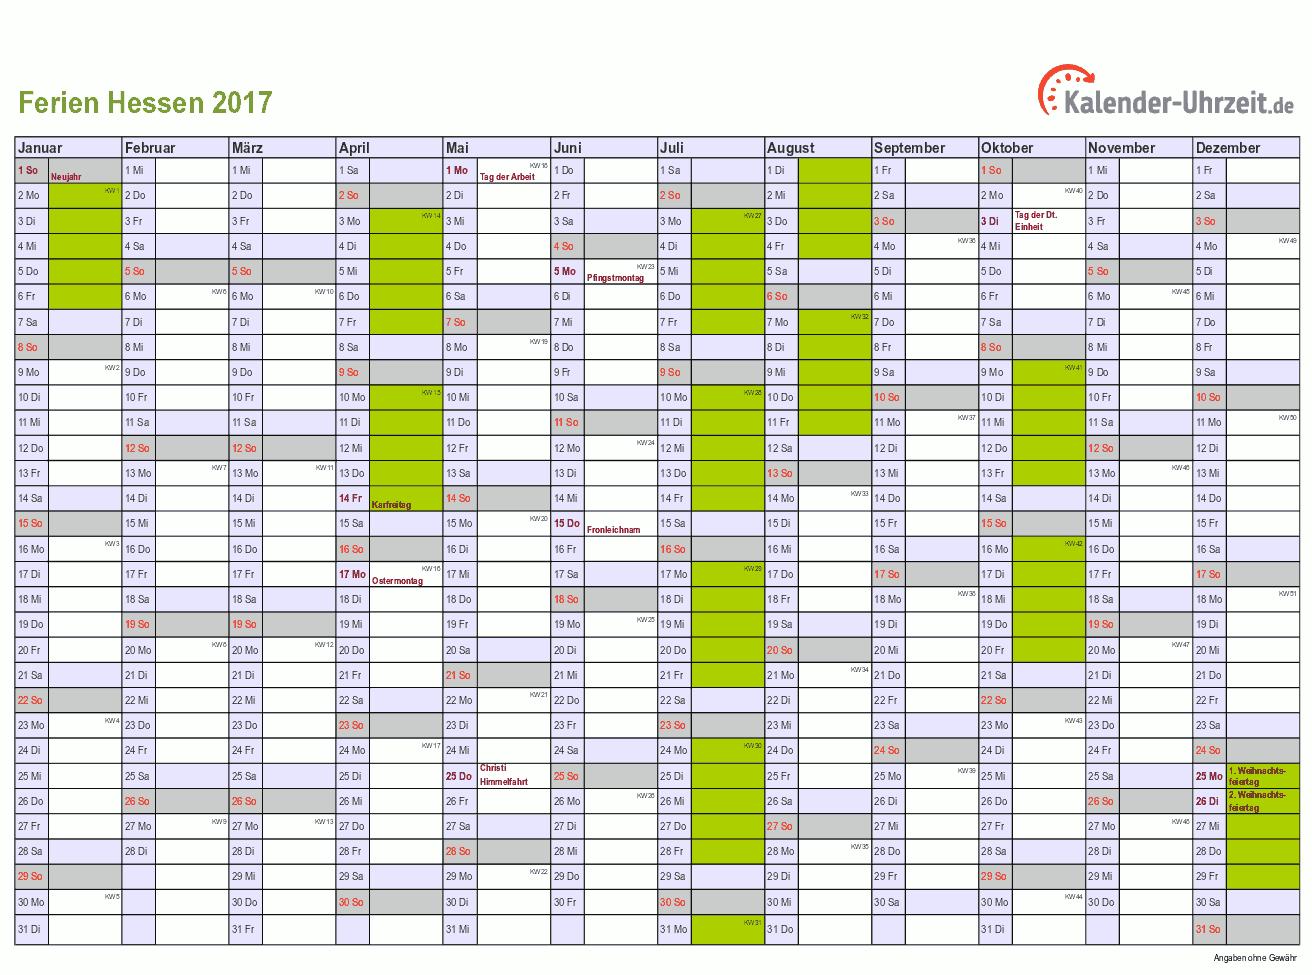 Ferien 2017 Hessen